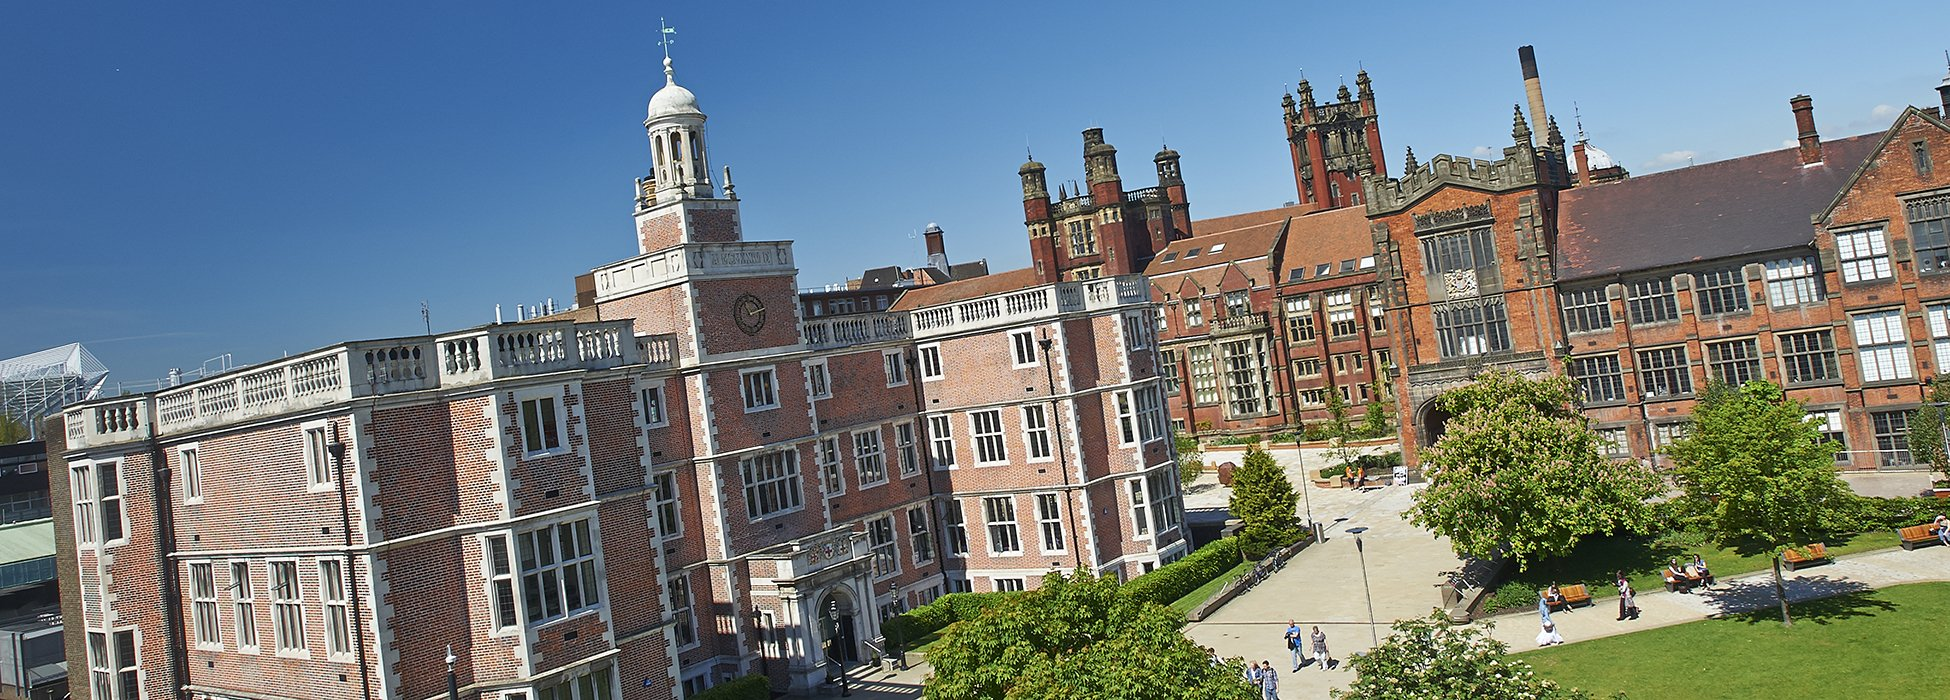 newcastle-university-aerial-view